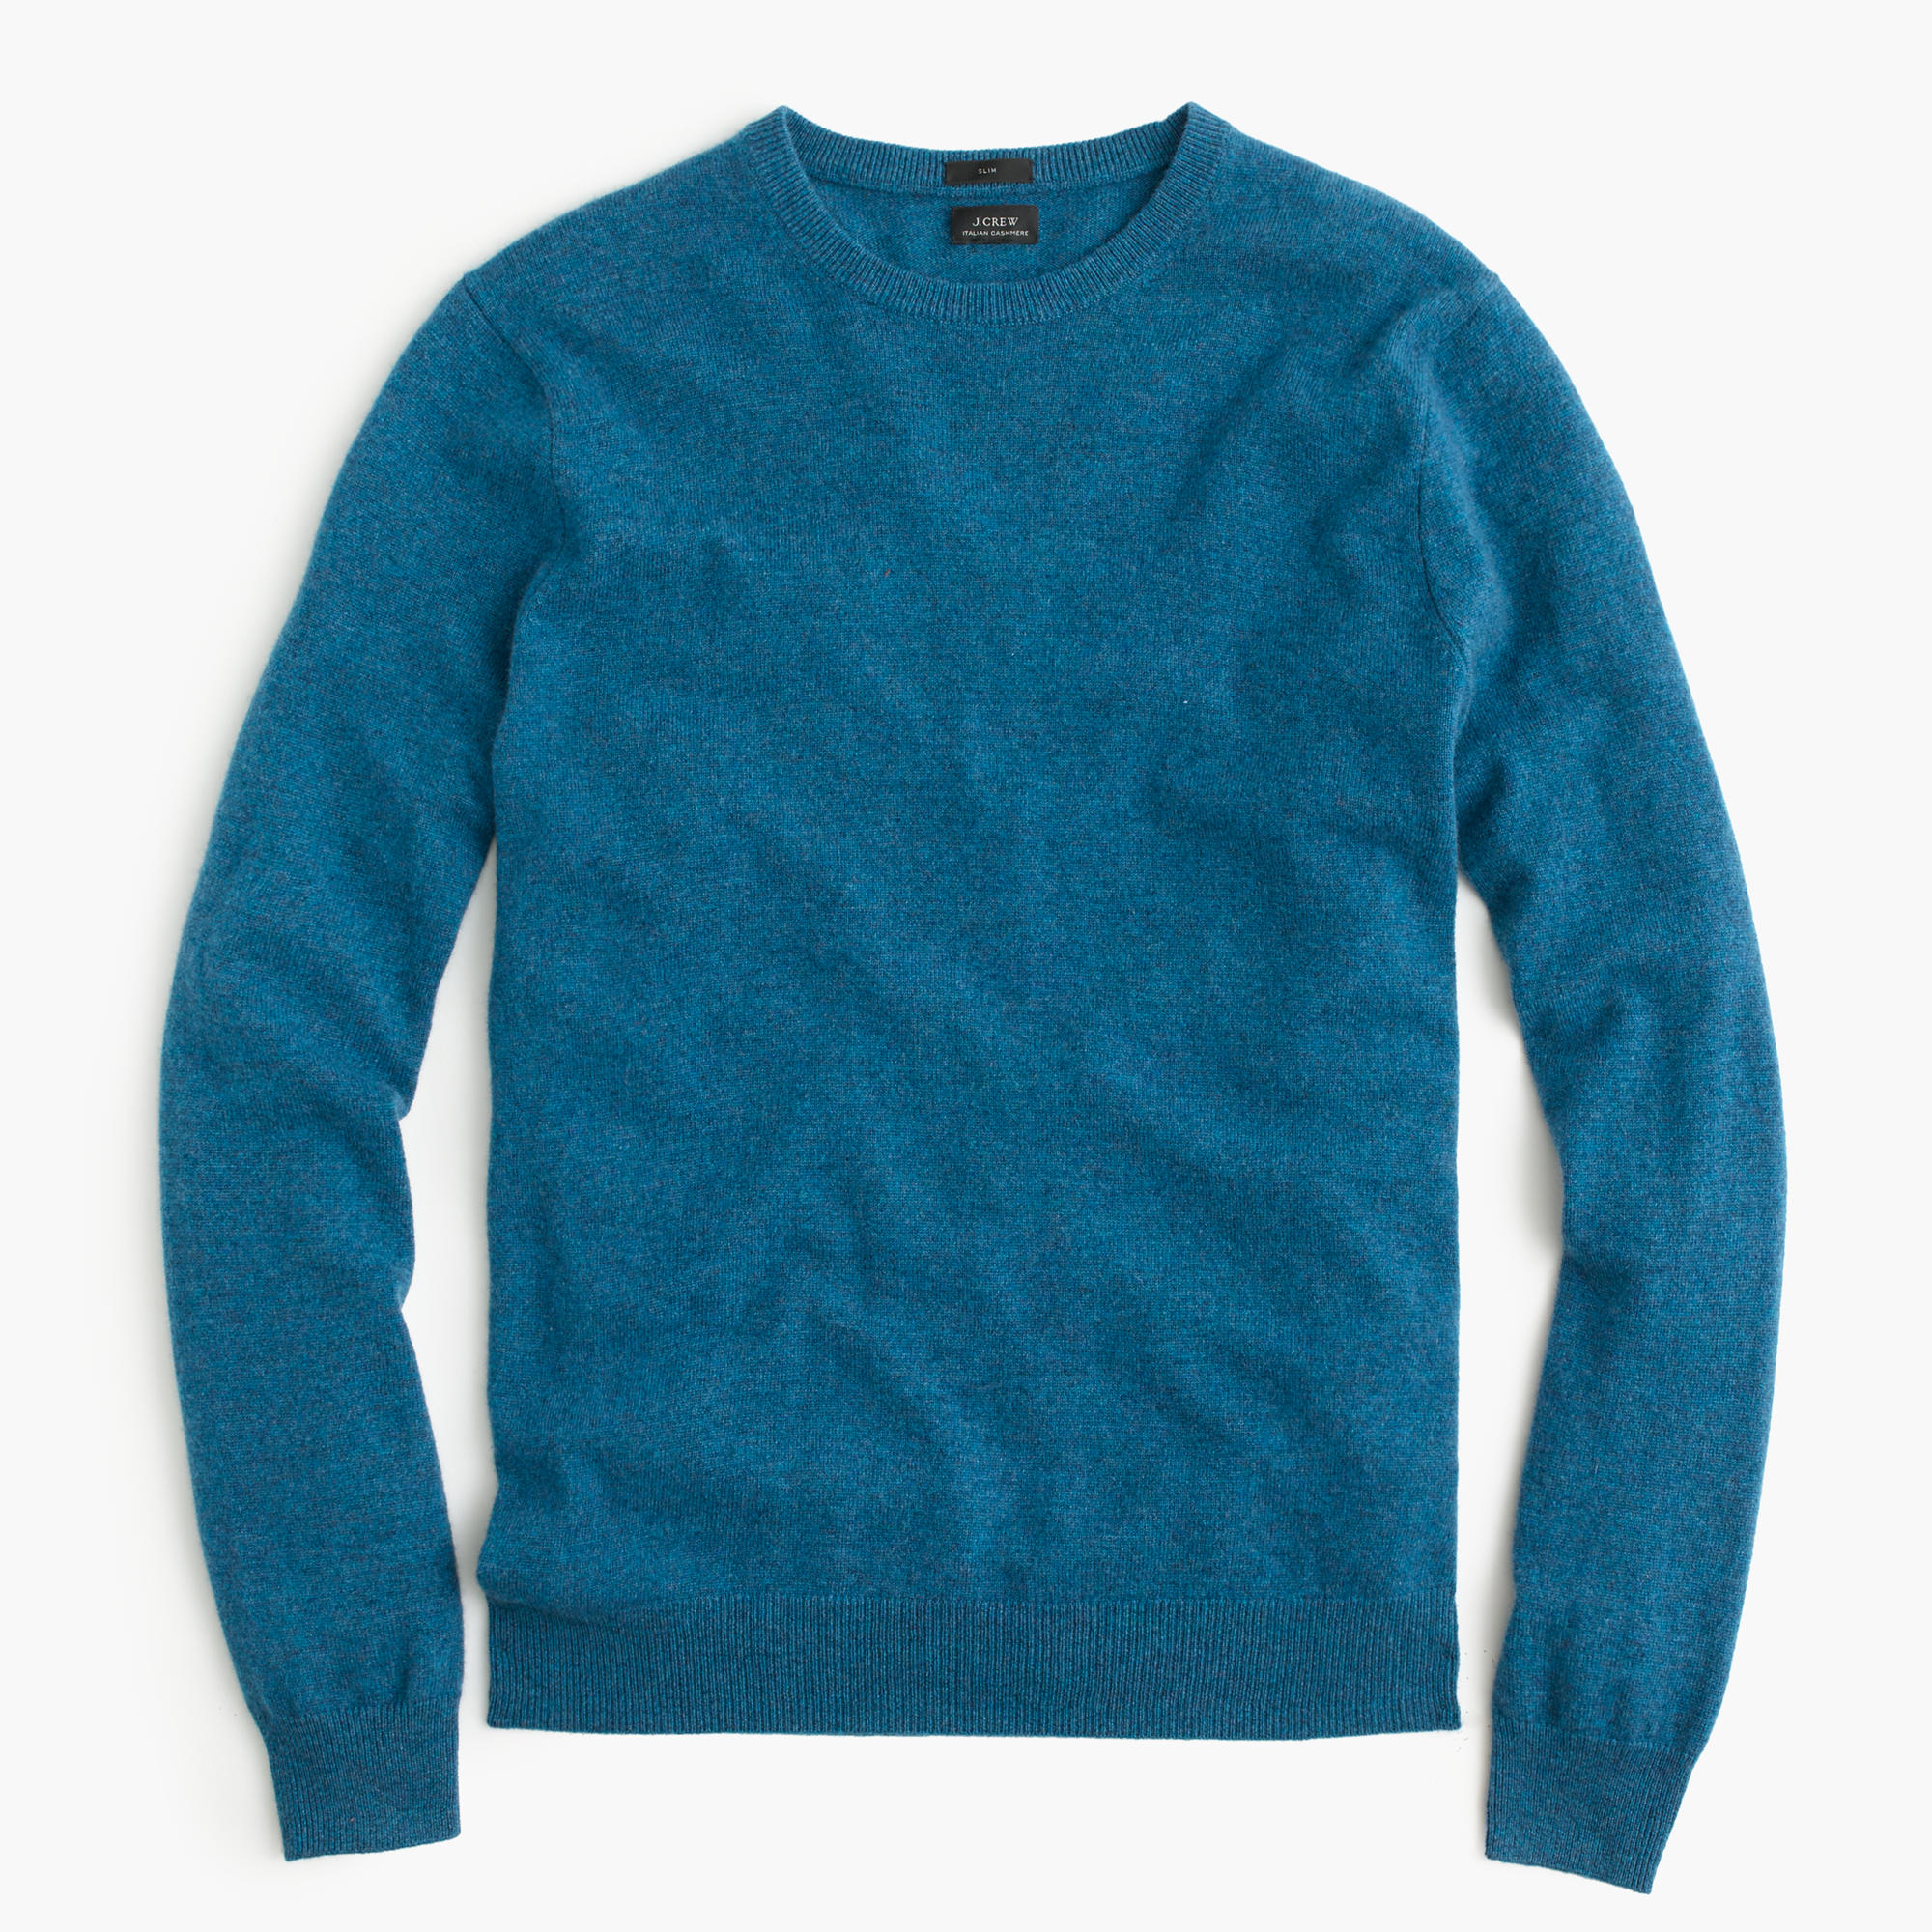 J.crew Slim Italian Cashmere Crewneck Sweater in Blue for ...